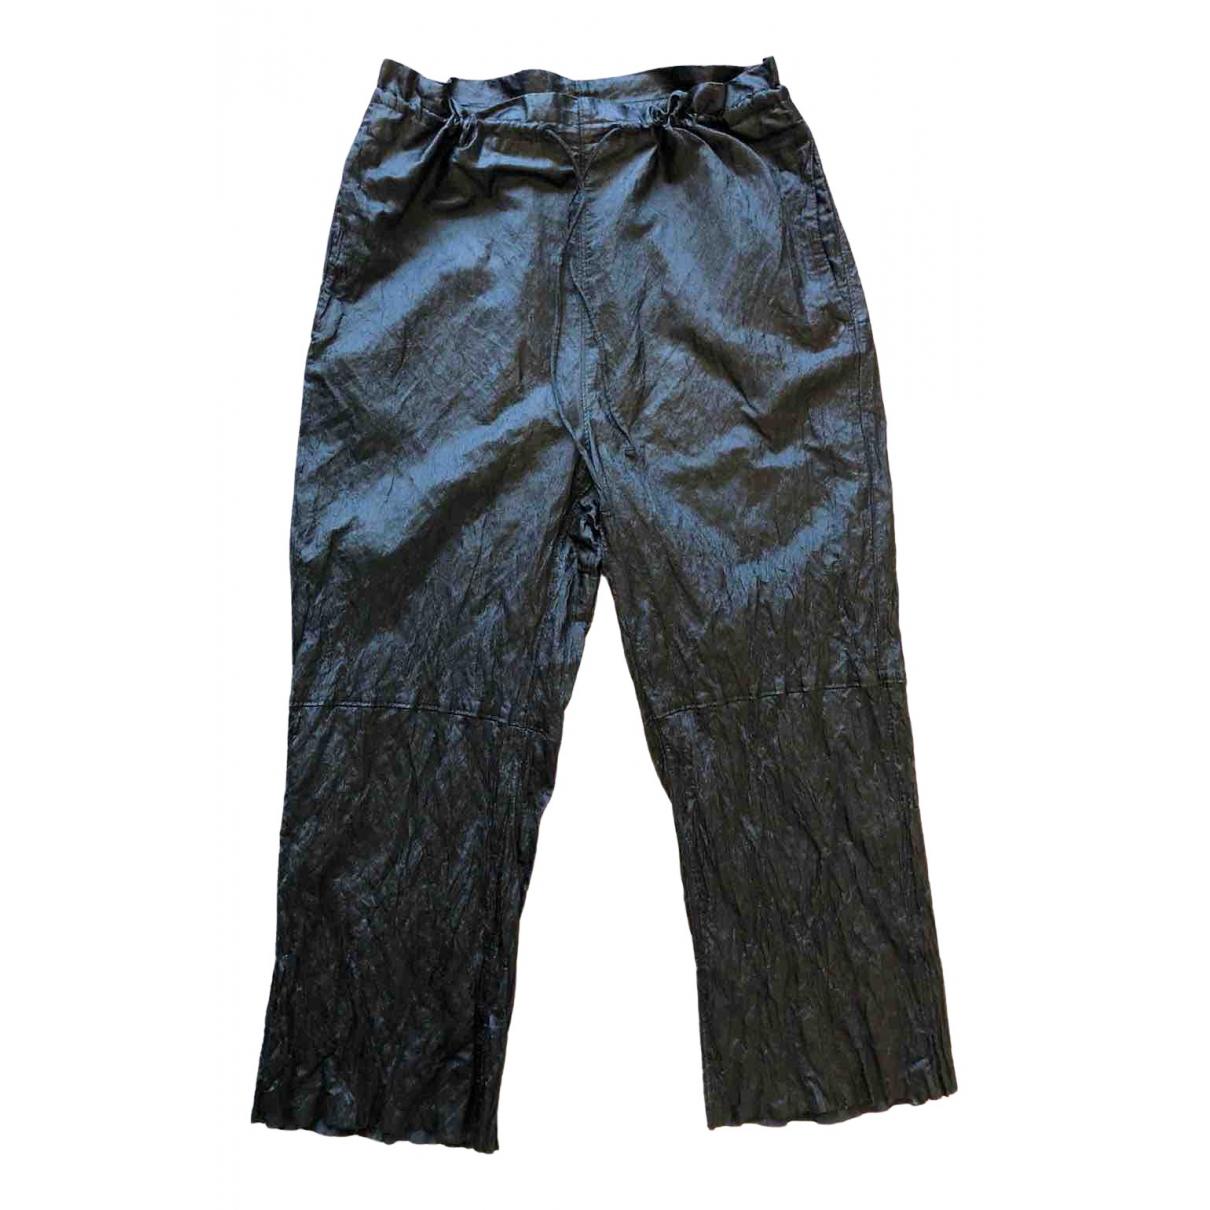 Mm6 \N Black Trousers for Women 38 FR